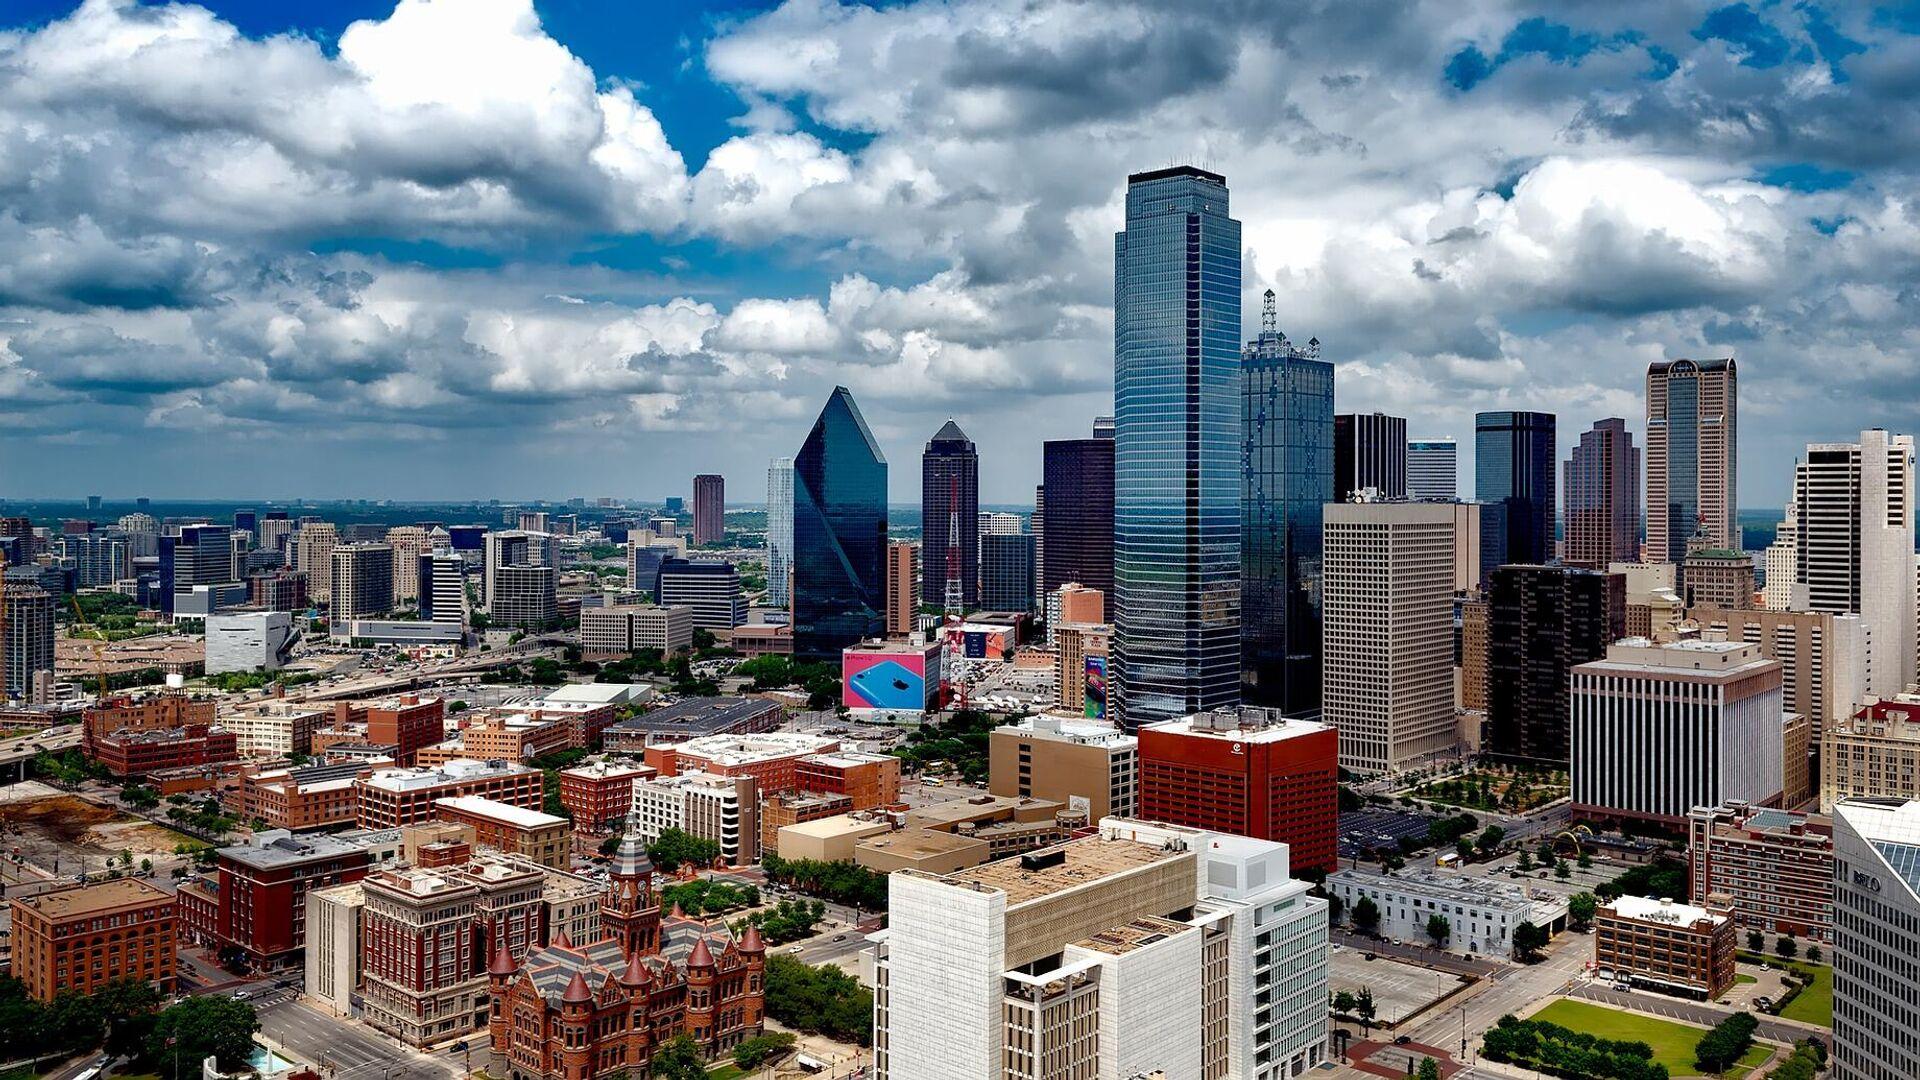 Dallas Texas City - Sputnik International, 1920, 24.09.2021